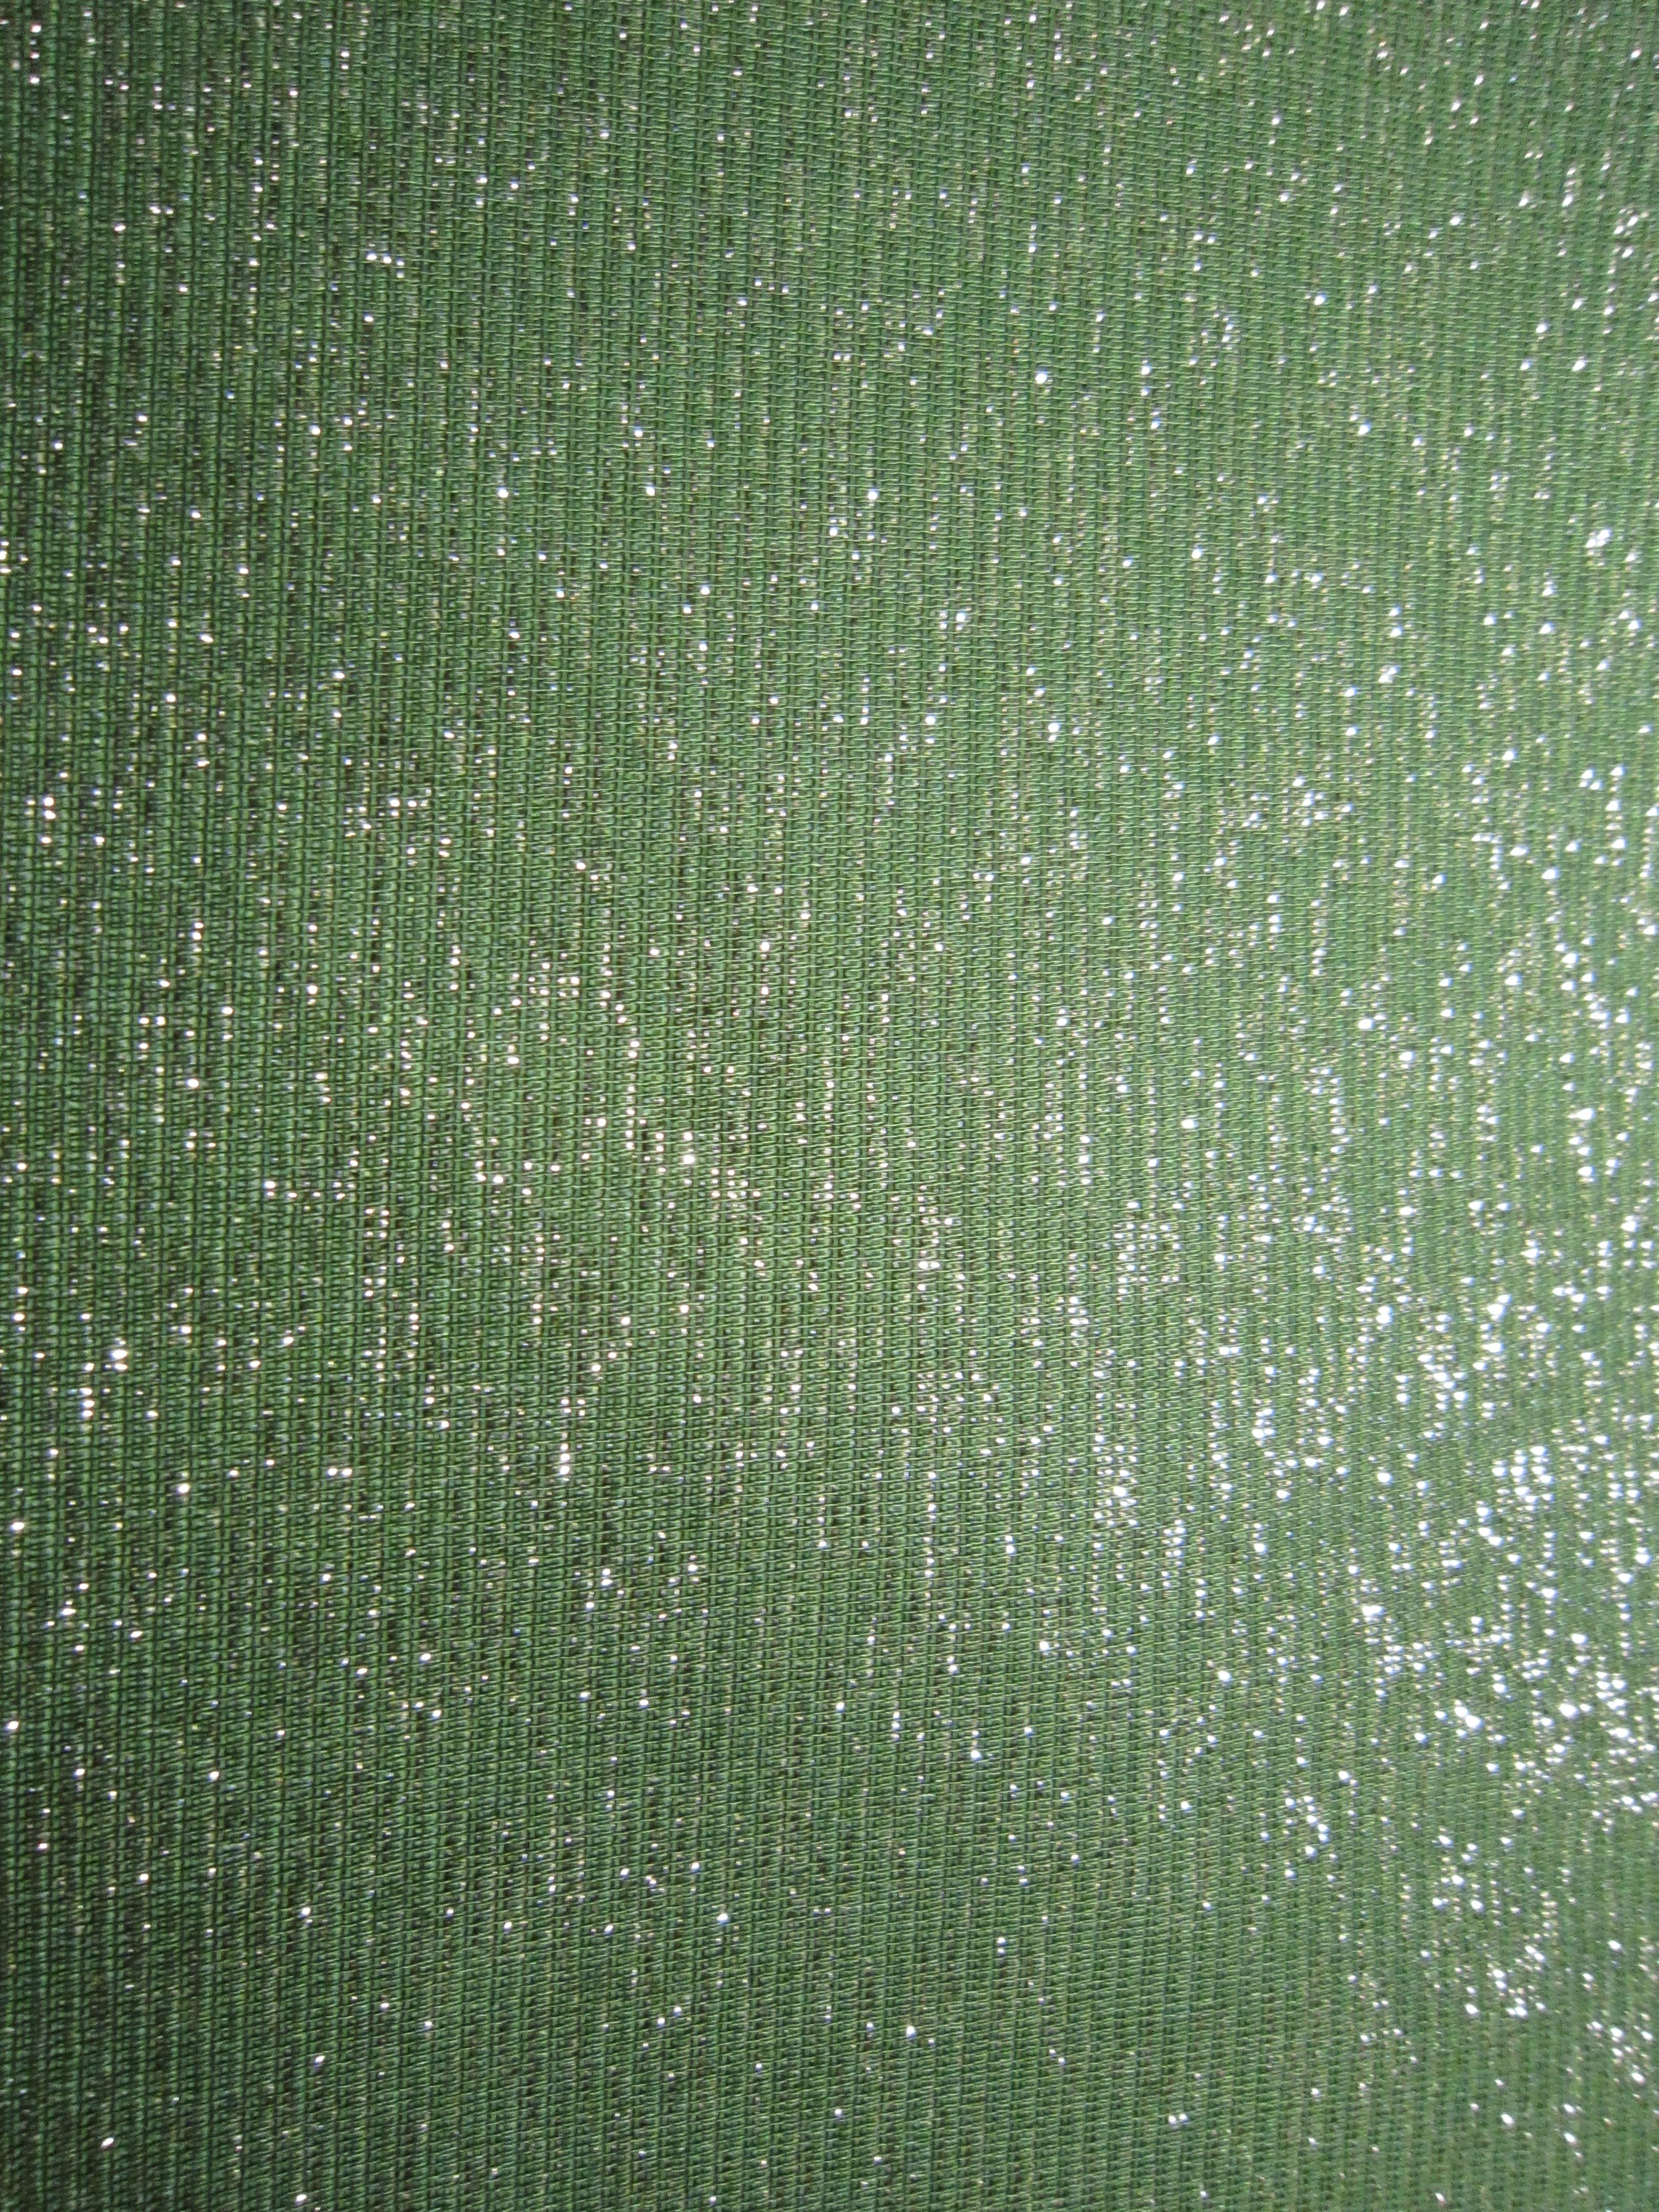 4024379_16-0096 faille lana lurex oro 0230 verde